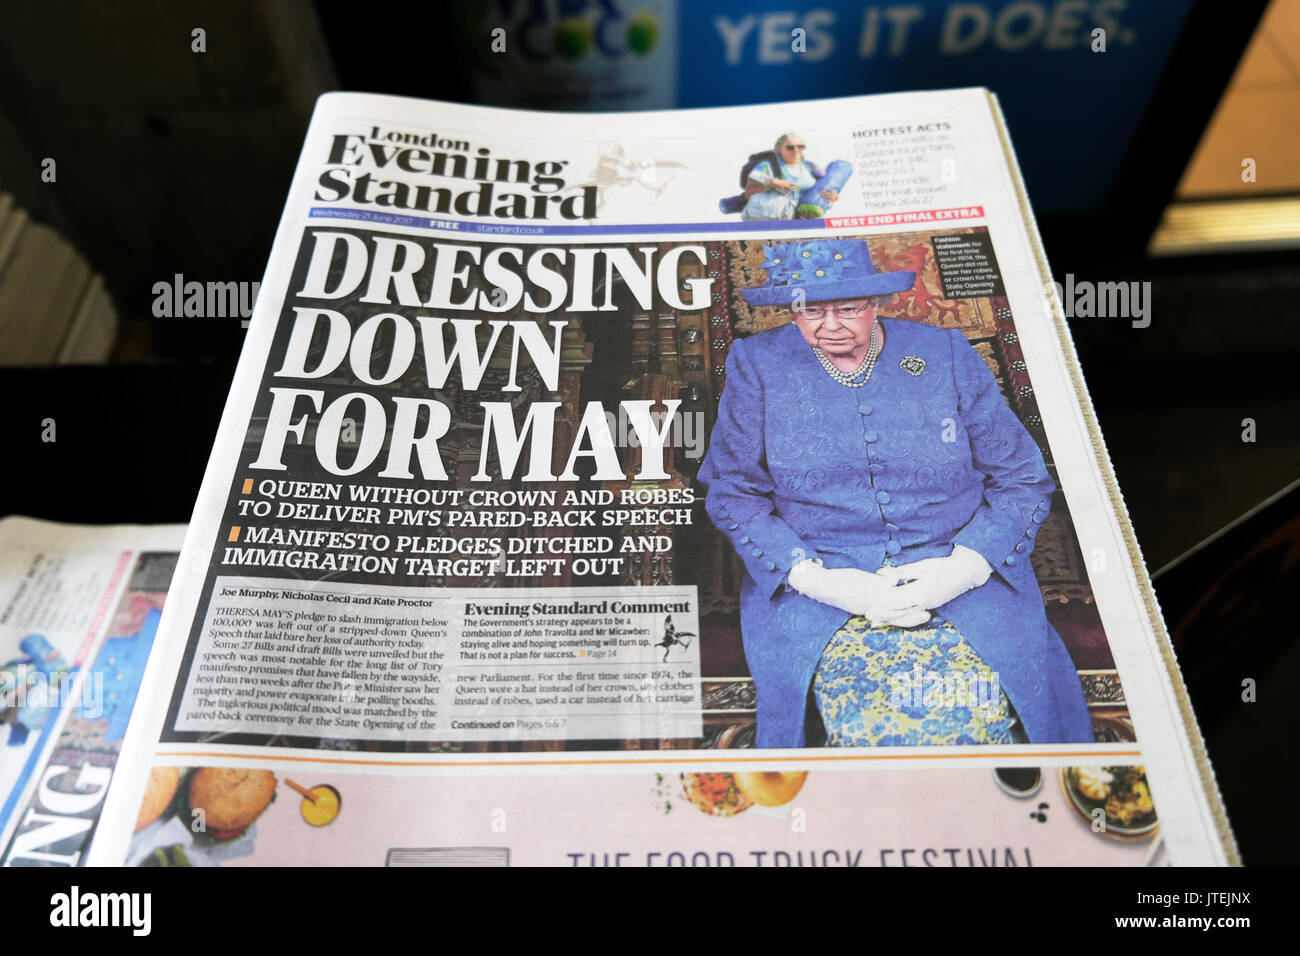 Evening Standard front page newspaper headline British Queen Elizabeth II  'Dressing down for May'  21 June - Stock Image